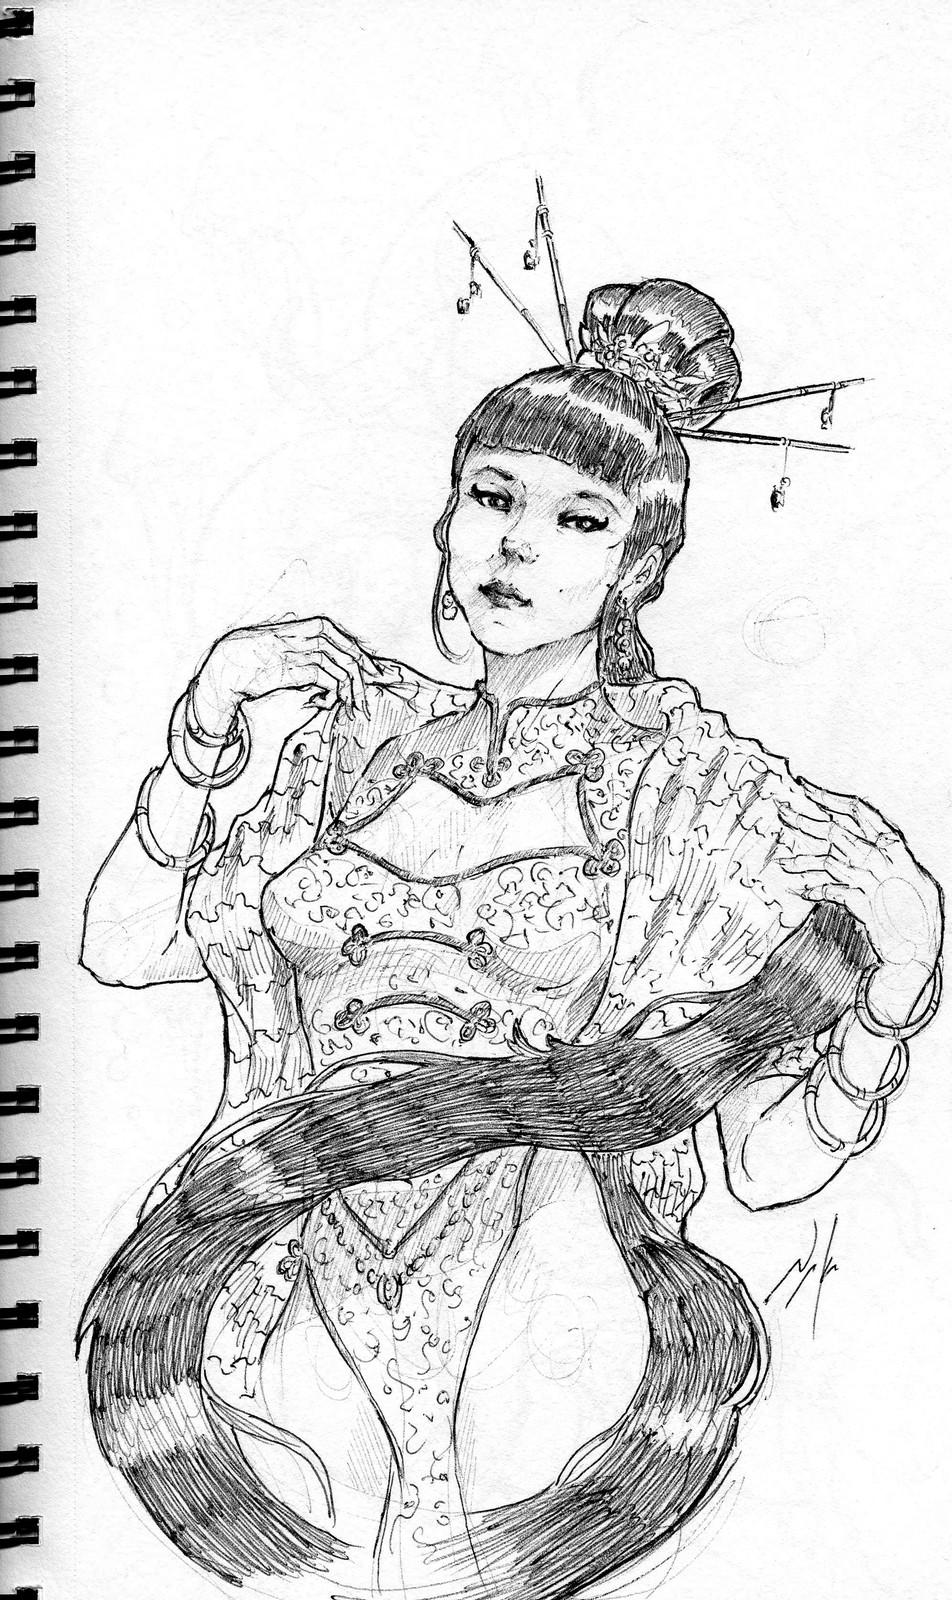 Empress sketches